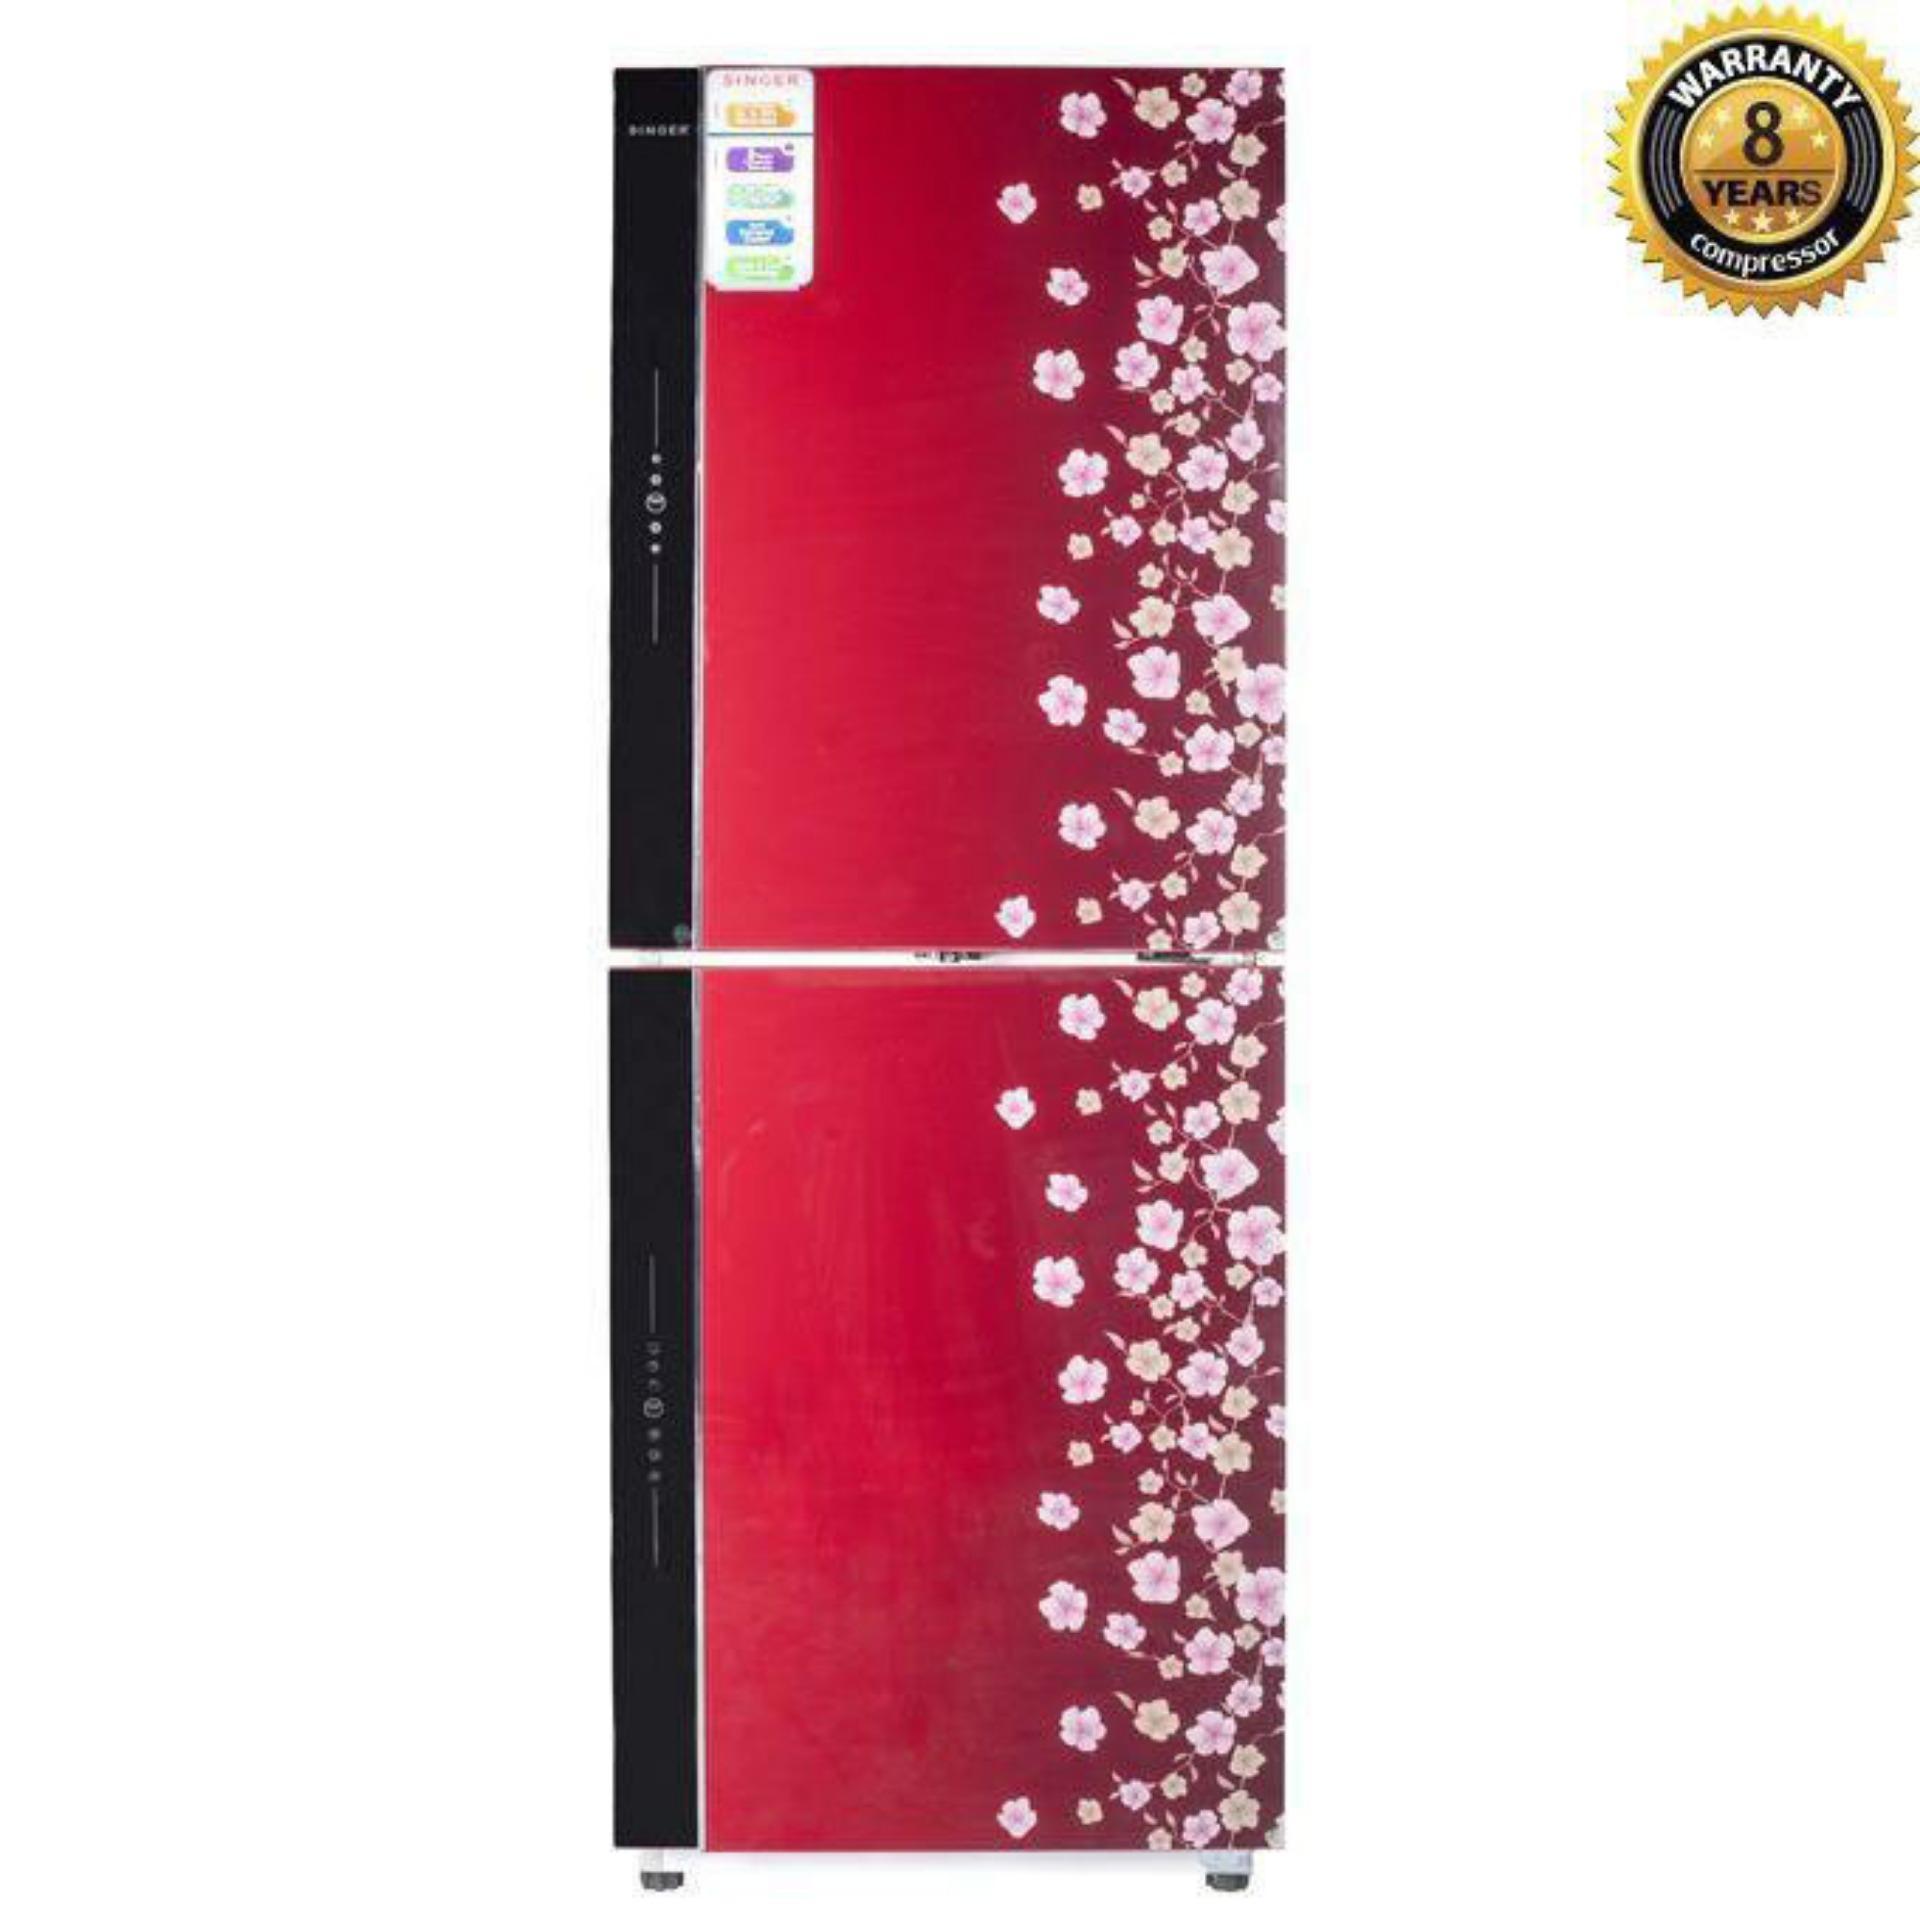 Singerasus Buy At Best Price In Bangladesh Www Asus X540ya Amd E1 7010 Singer G Bcd 238 Top Mount Refrigerator 238l Red